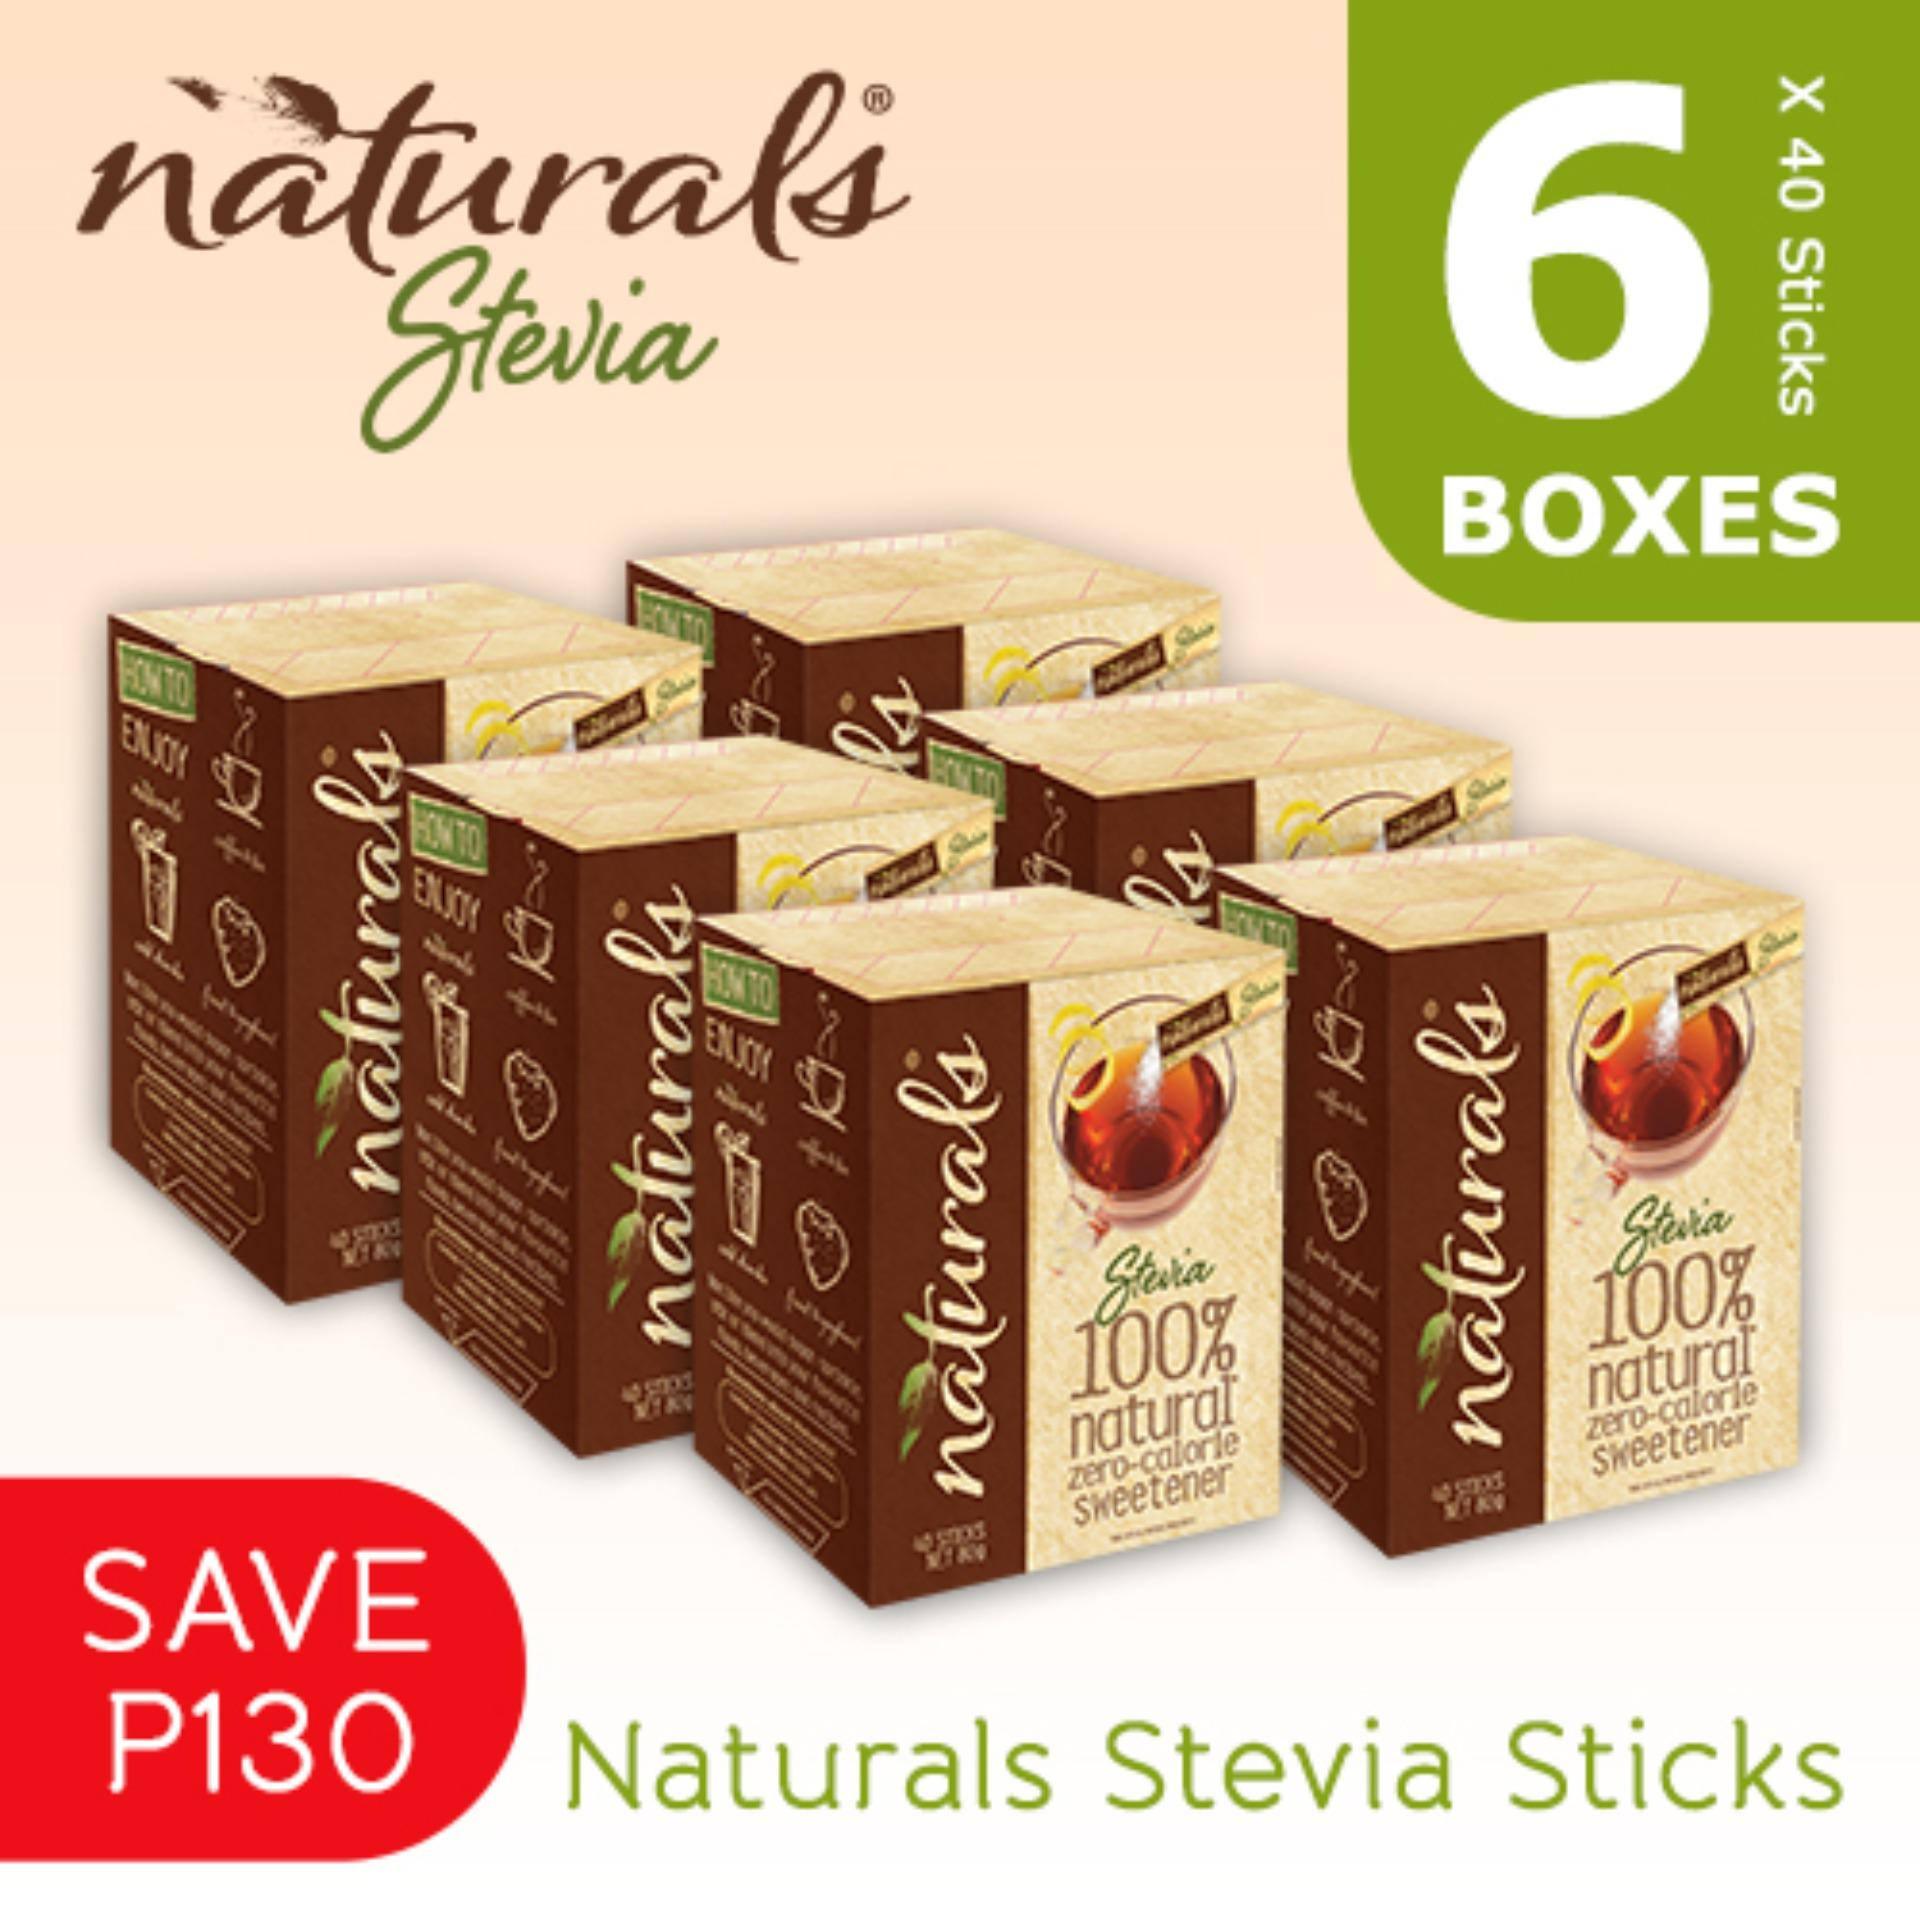 Naturals Stevia Philippines Price List Sweetener Tropicana Slim Zero Calorie 40 Sticks Value Pack 6 Boxes X